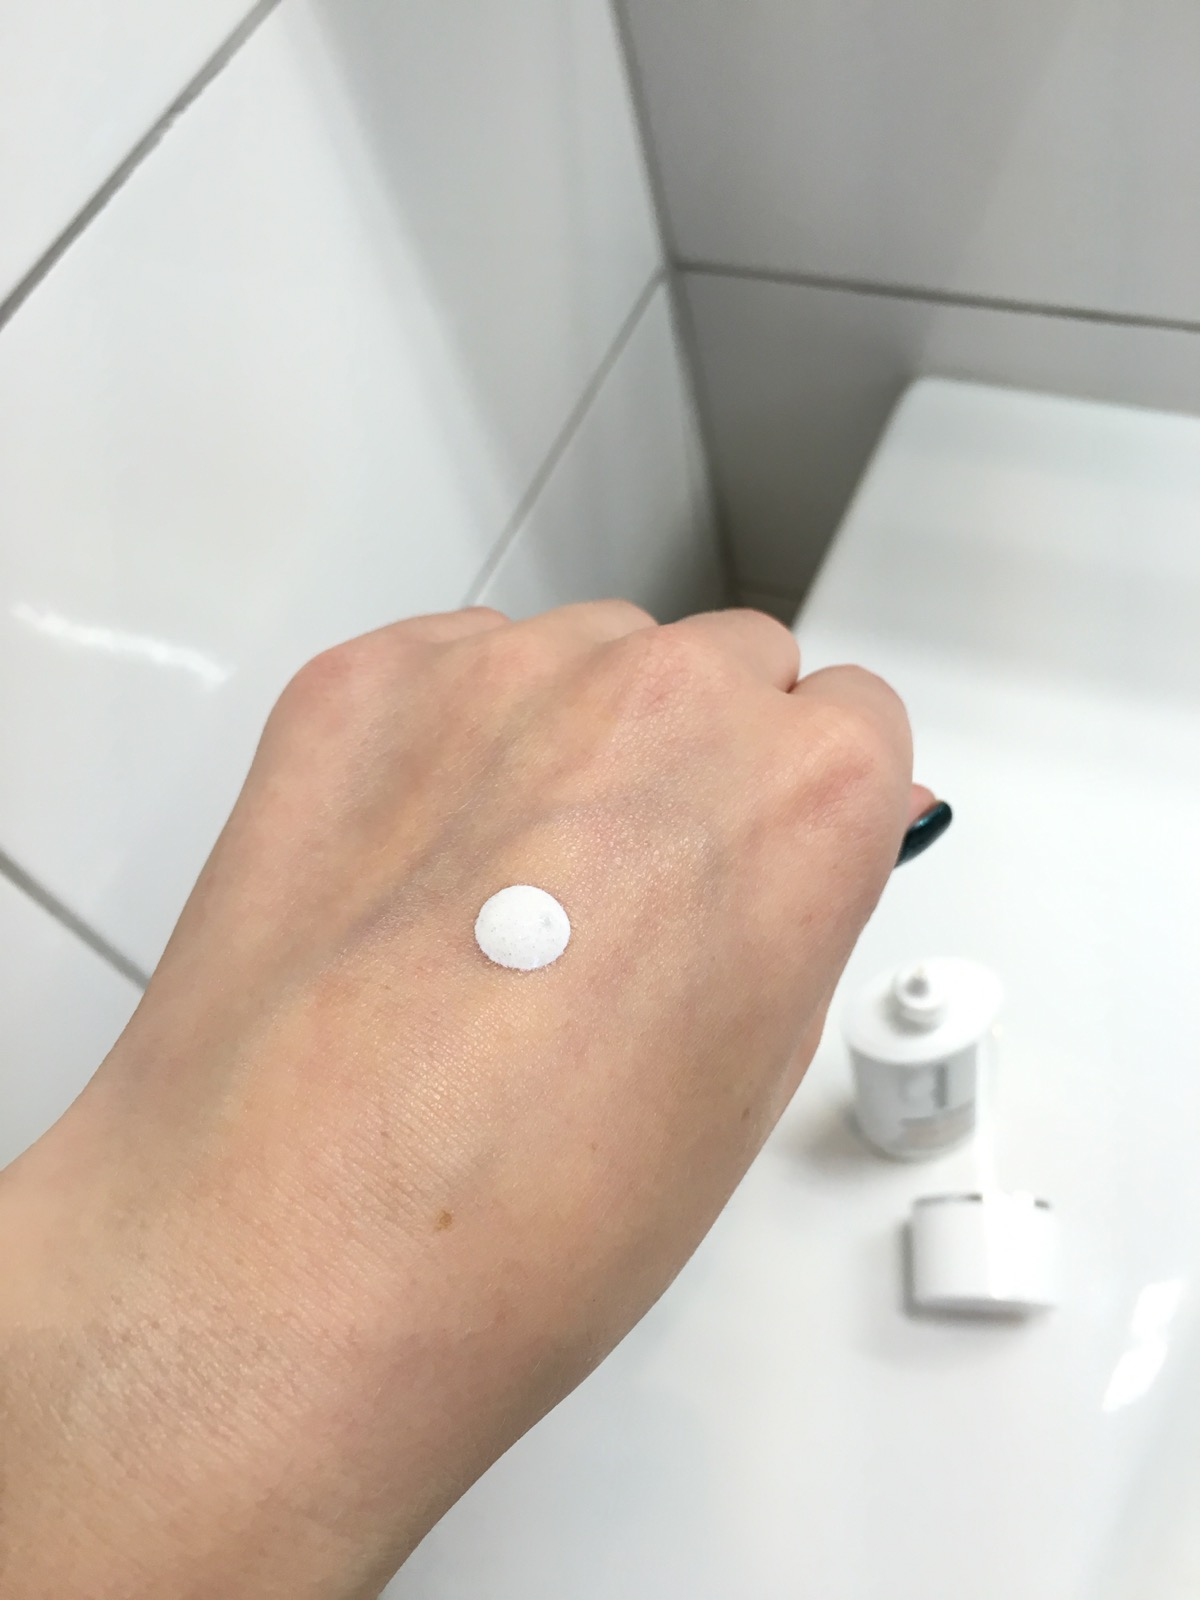 bareMinerals Prep Step Mineral Primer SPF50 dot on hand|skonhetssnack.se